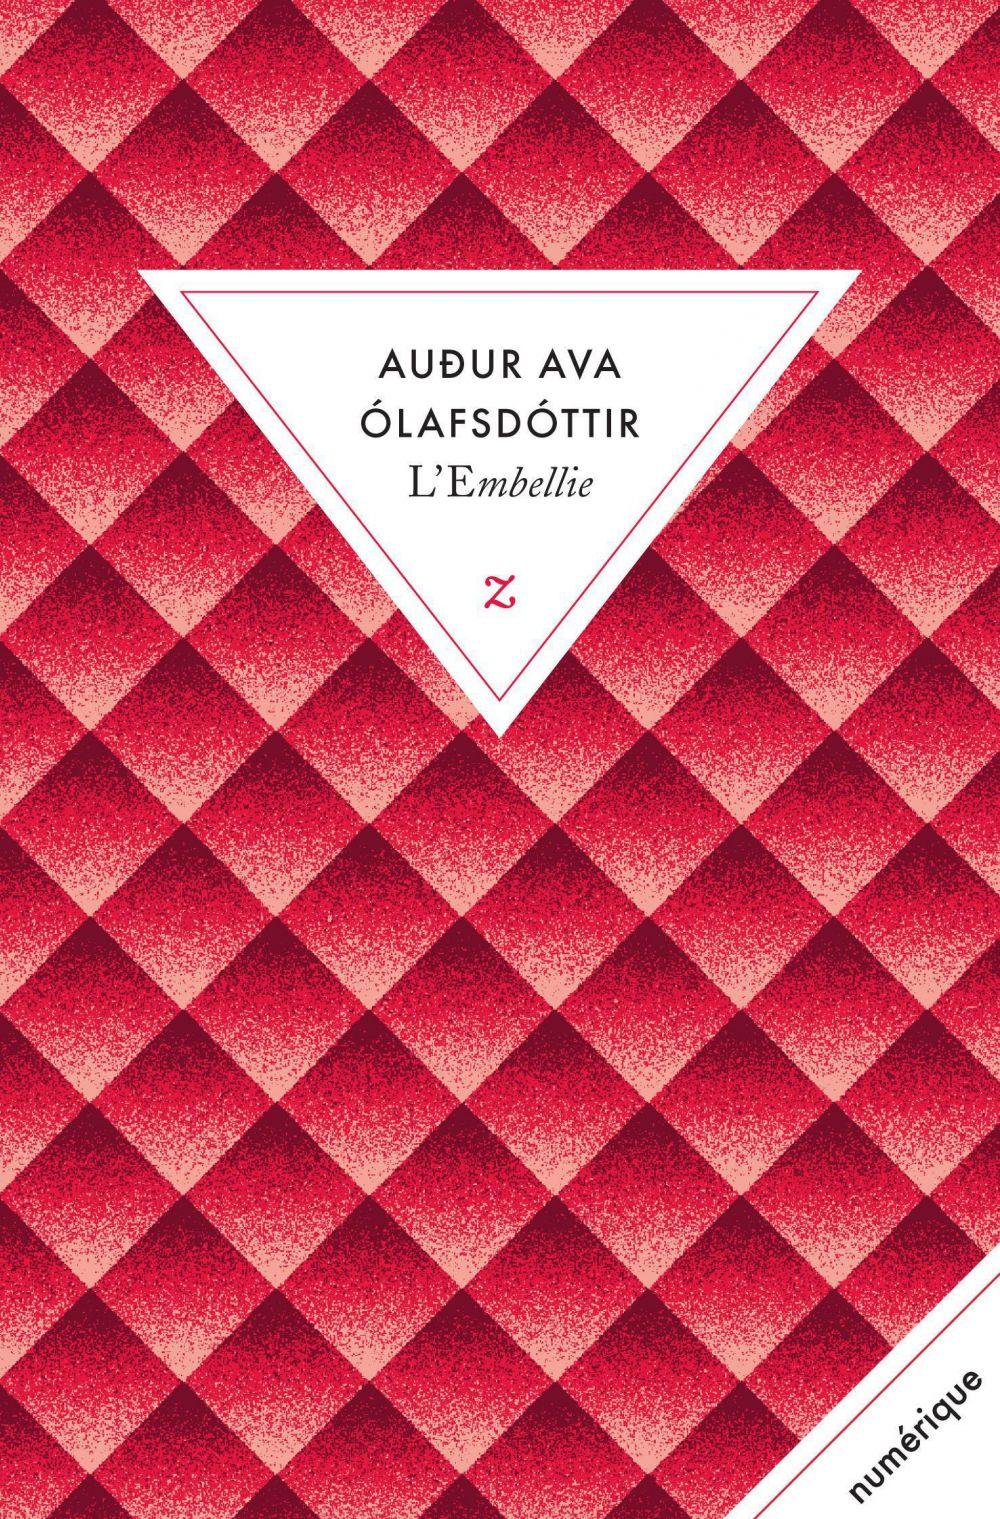 L'Embellie   Olafsdottir, Audur Ava. Auteur